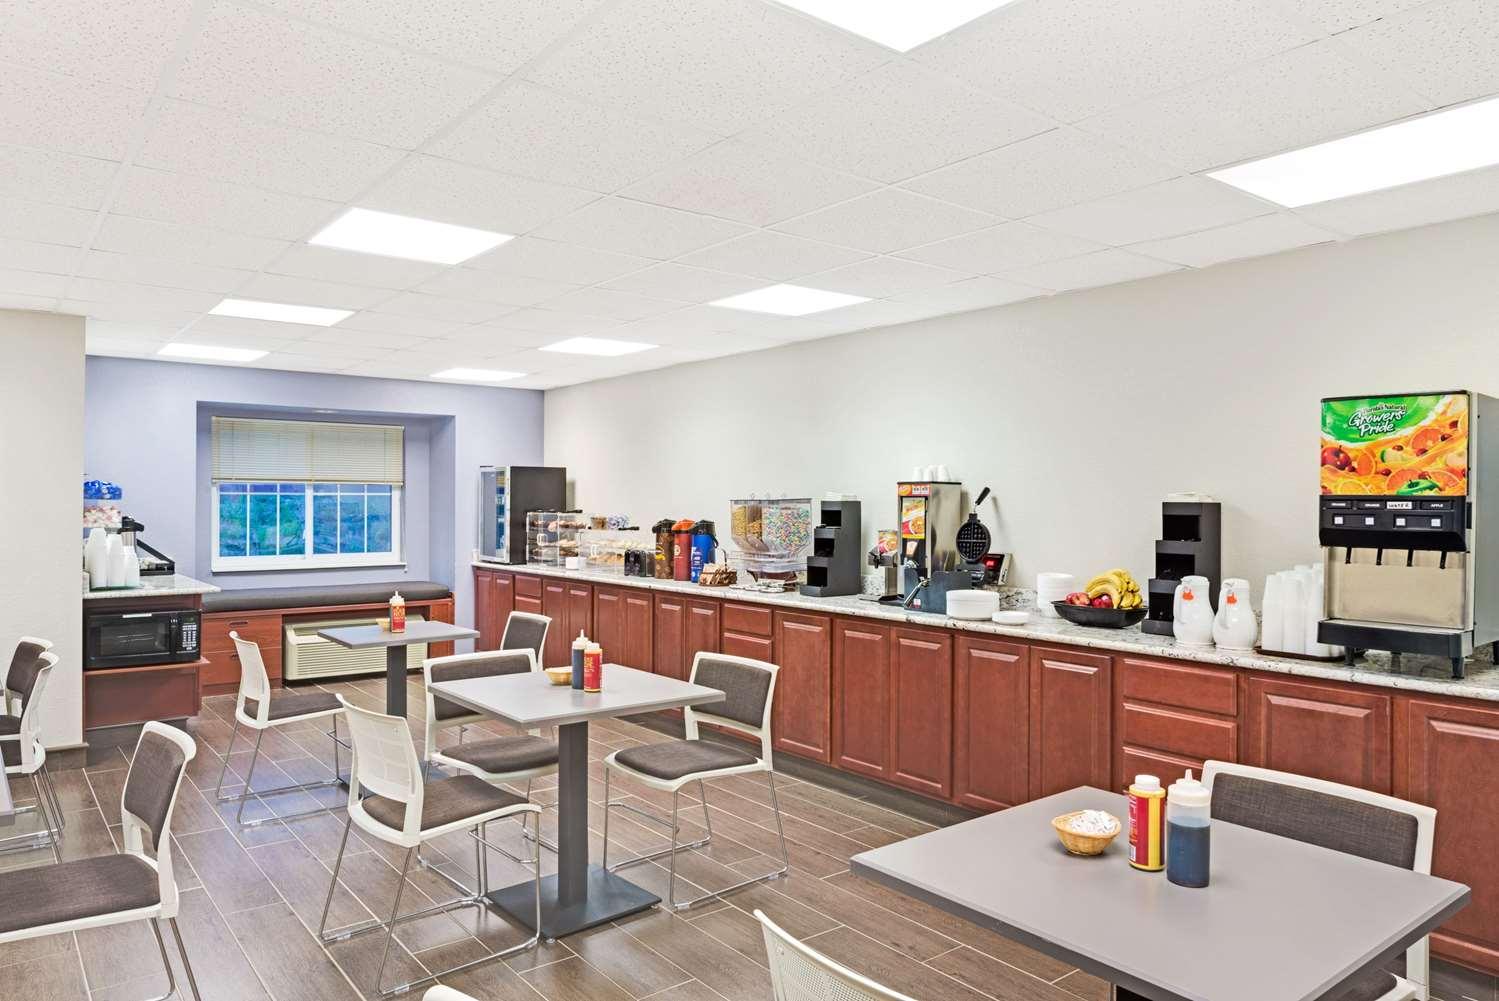 proam - Microtel Inn & Suites by Wyndham Urbandale